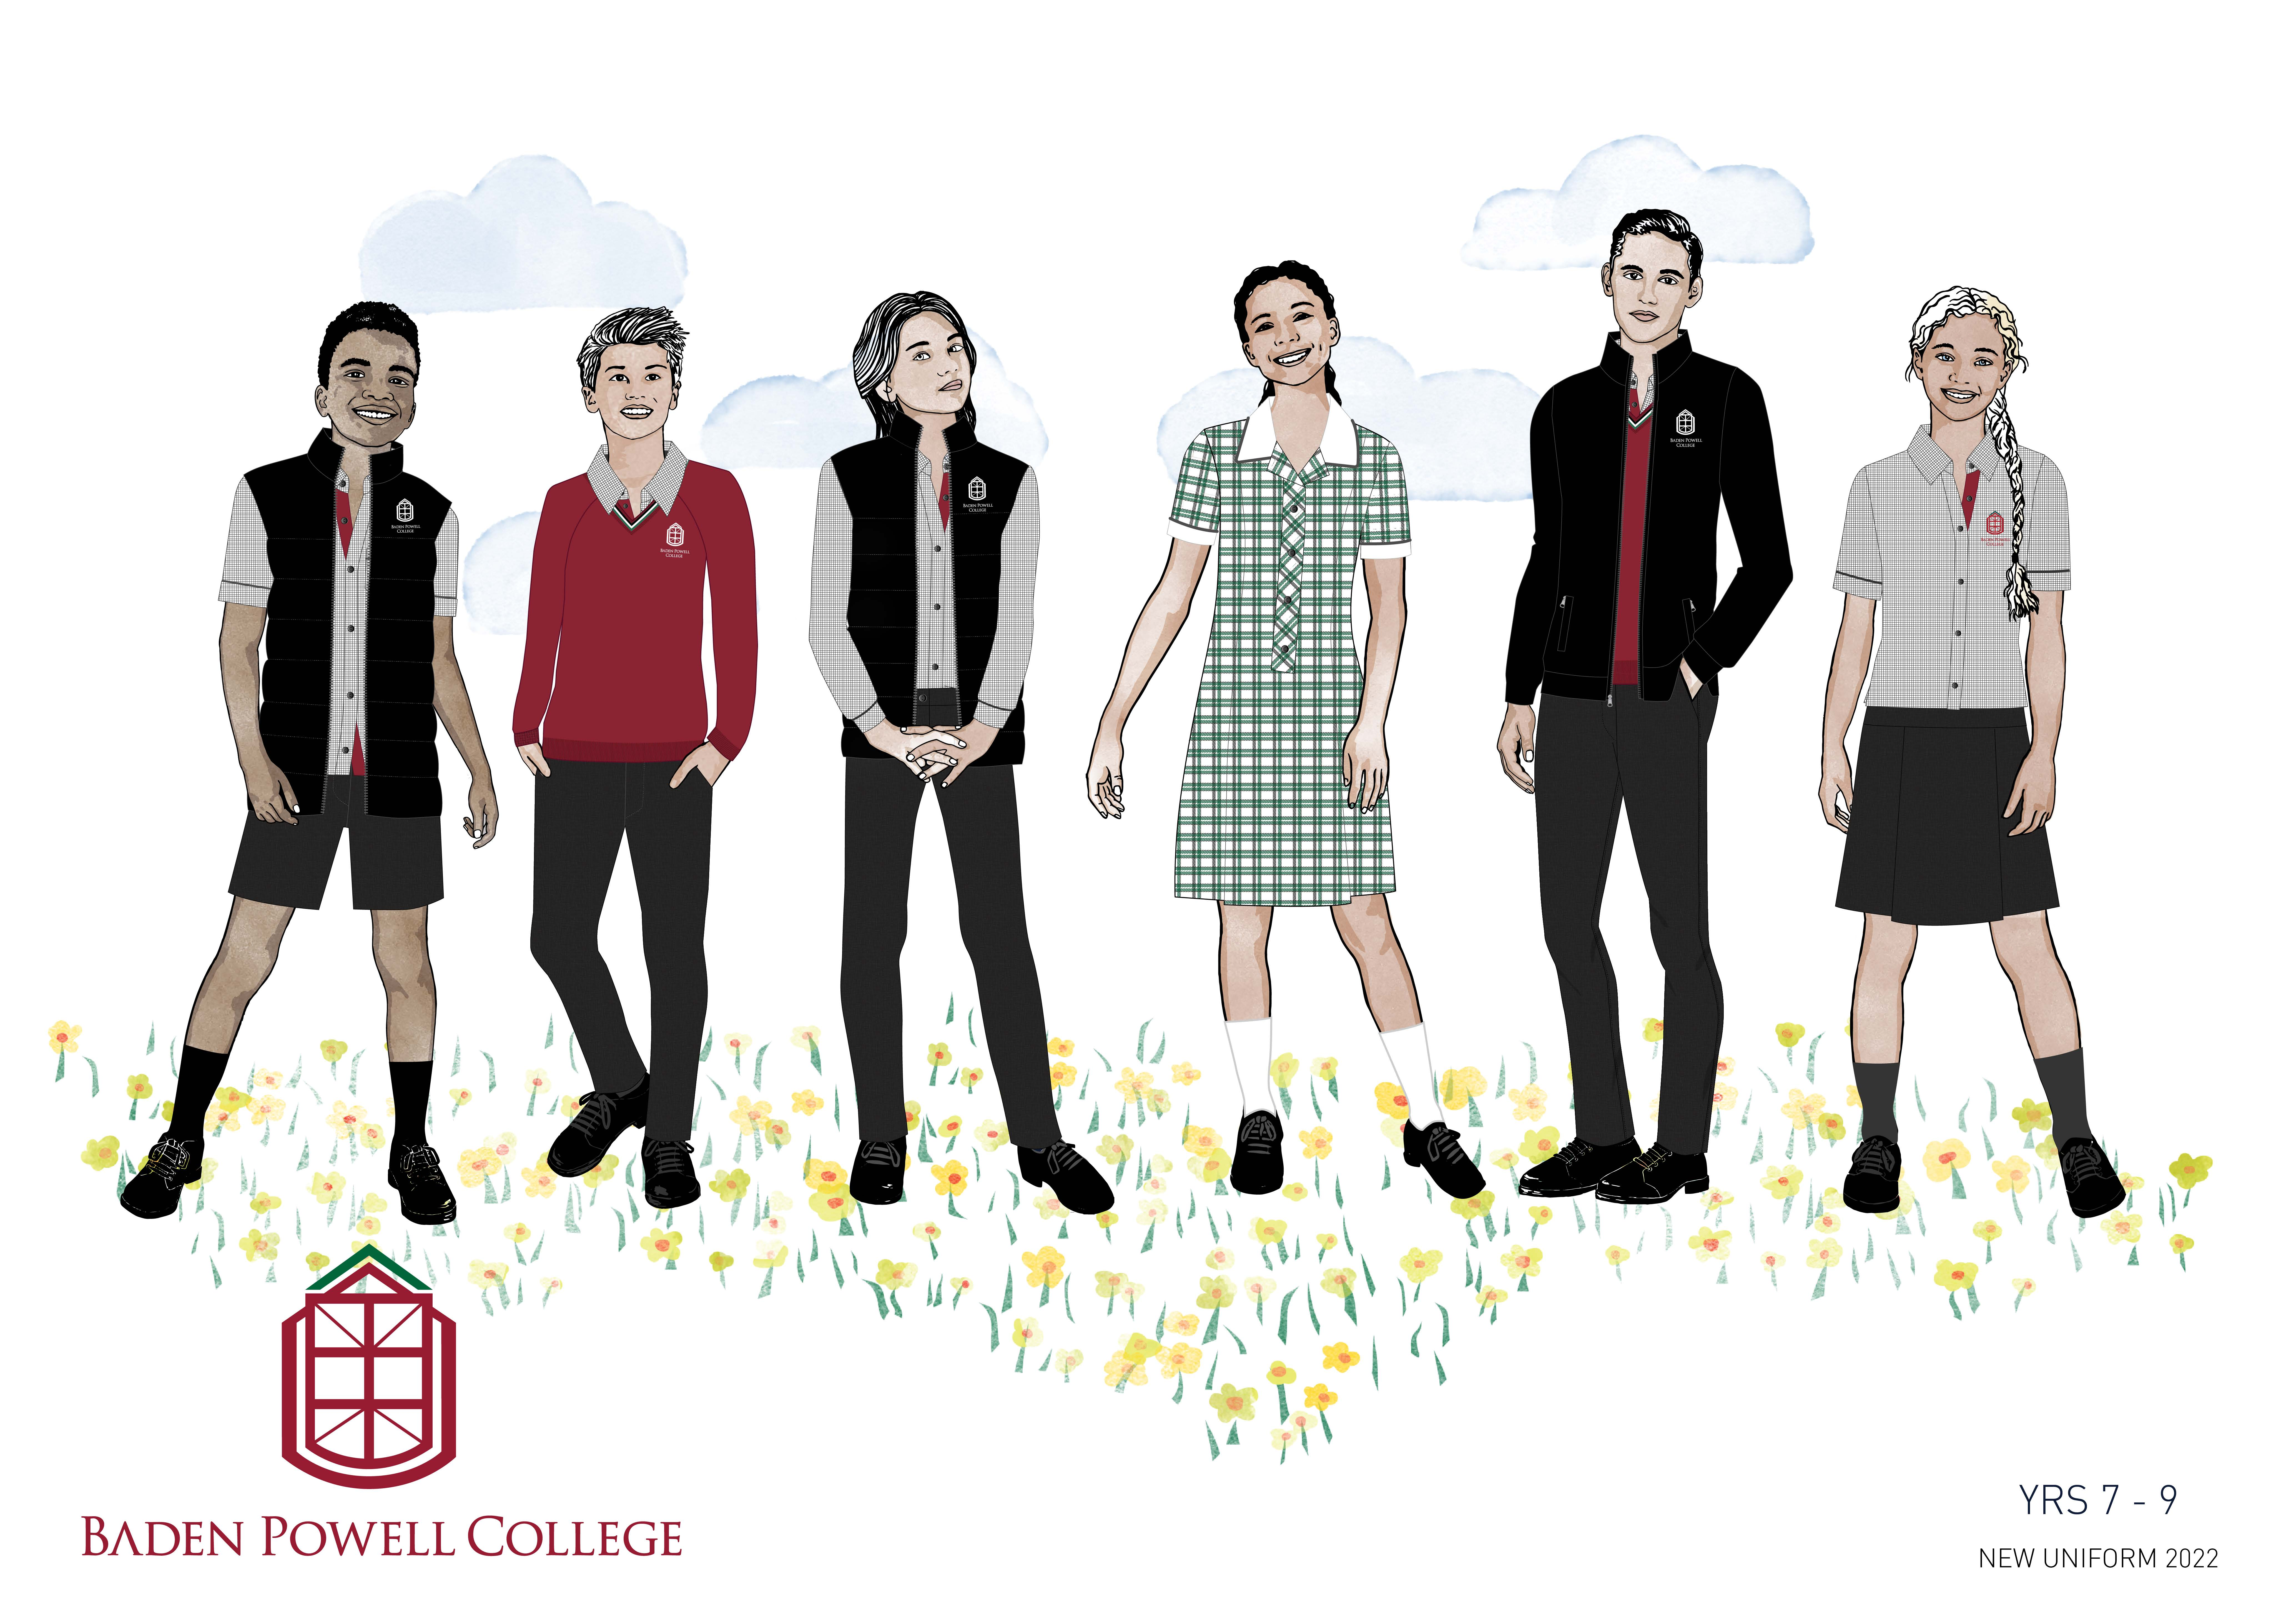 Uniforms Years 7 - 9